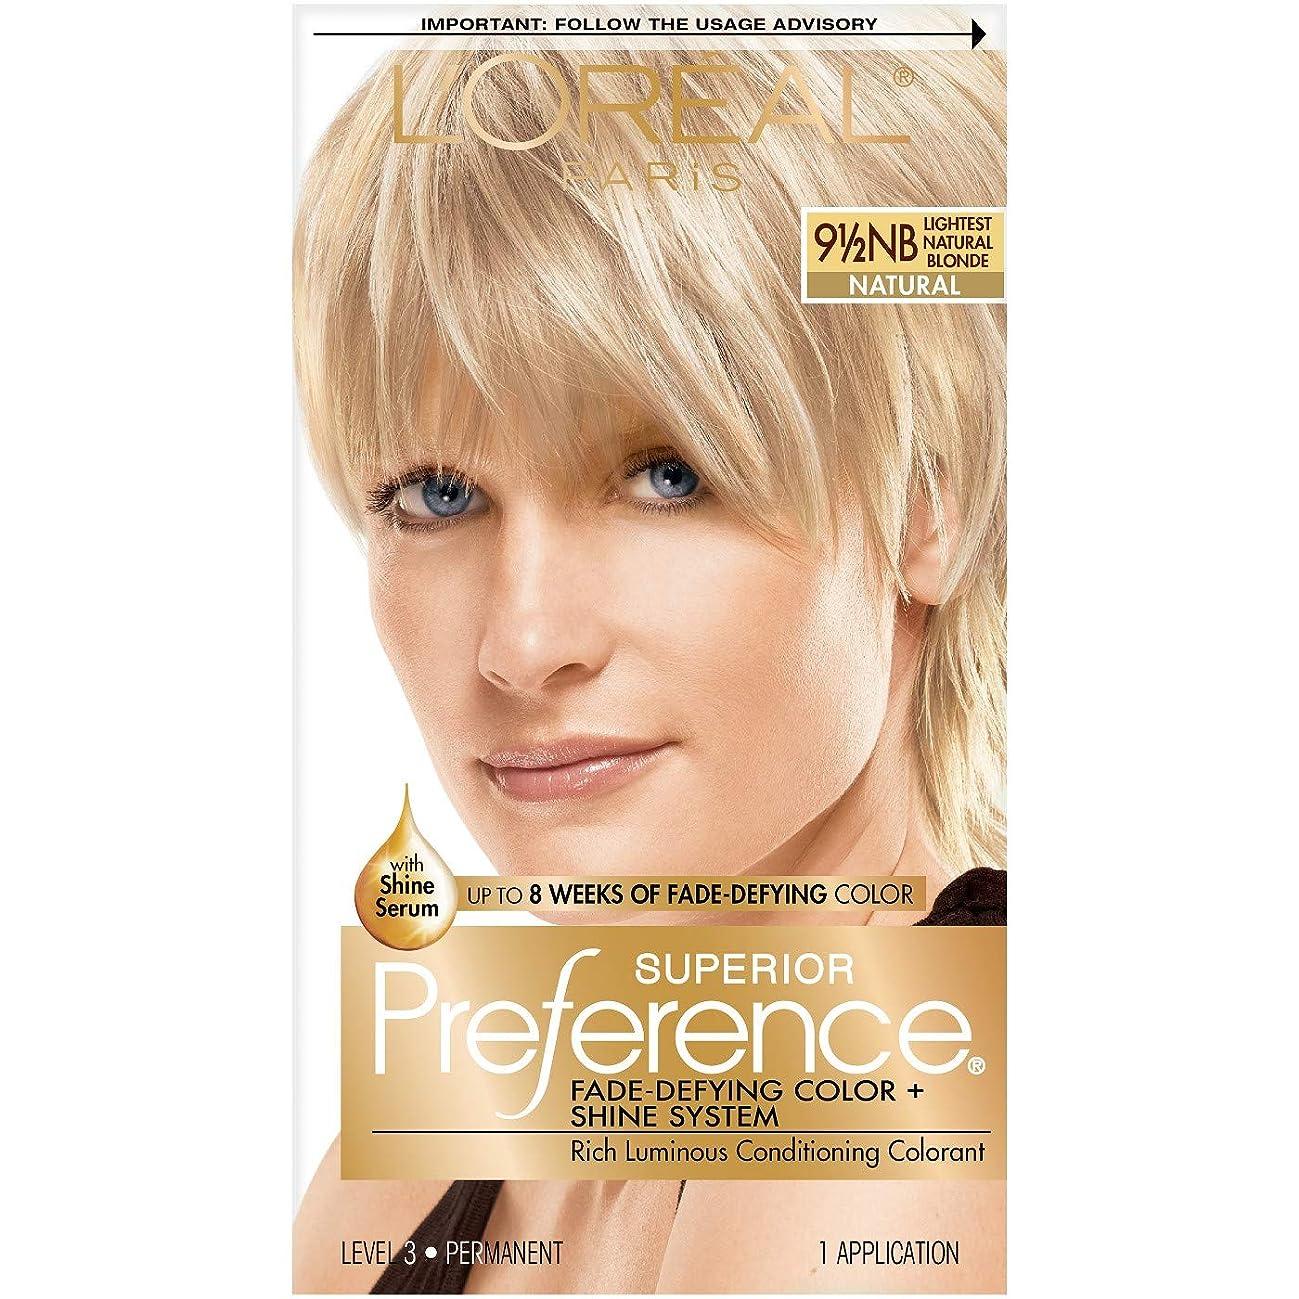 L'Oreal Superior Preference - 9-1/2NB Lightest Natural Blonde (Natural) 1 Each (Pack of 3)